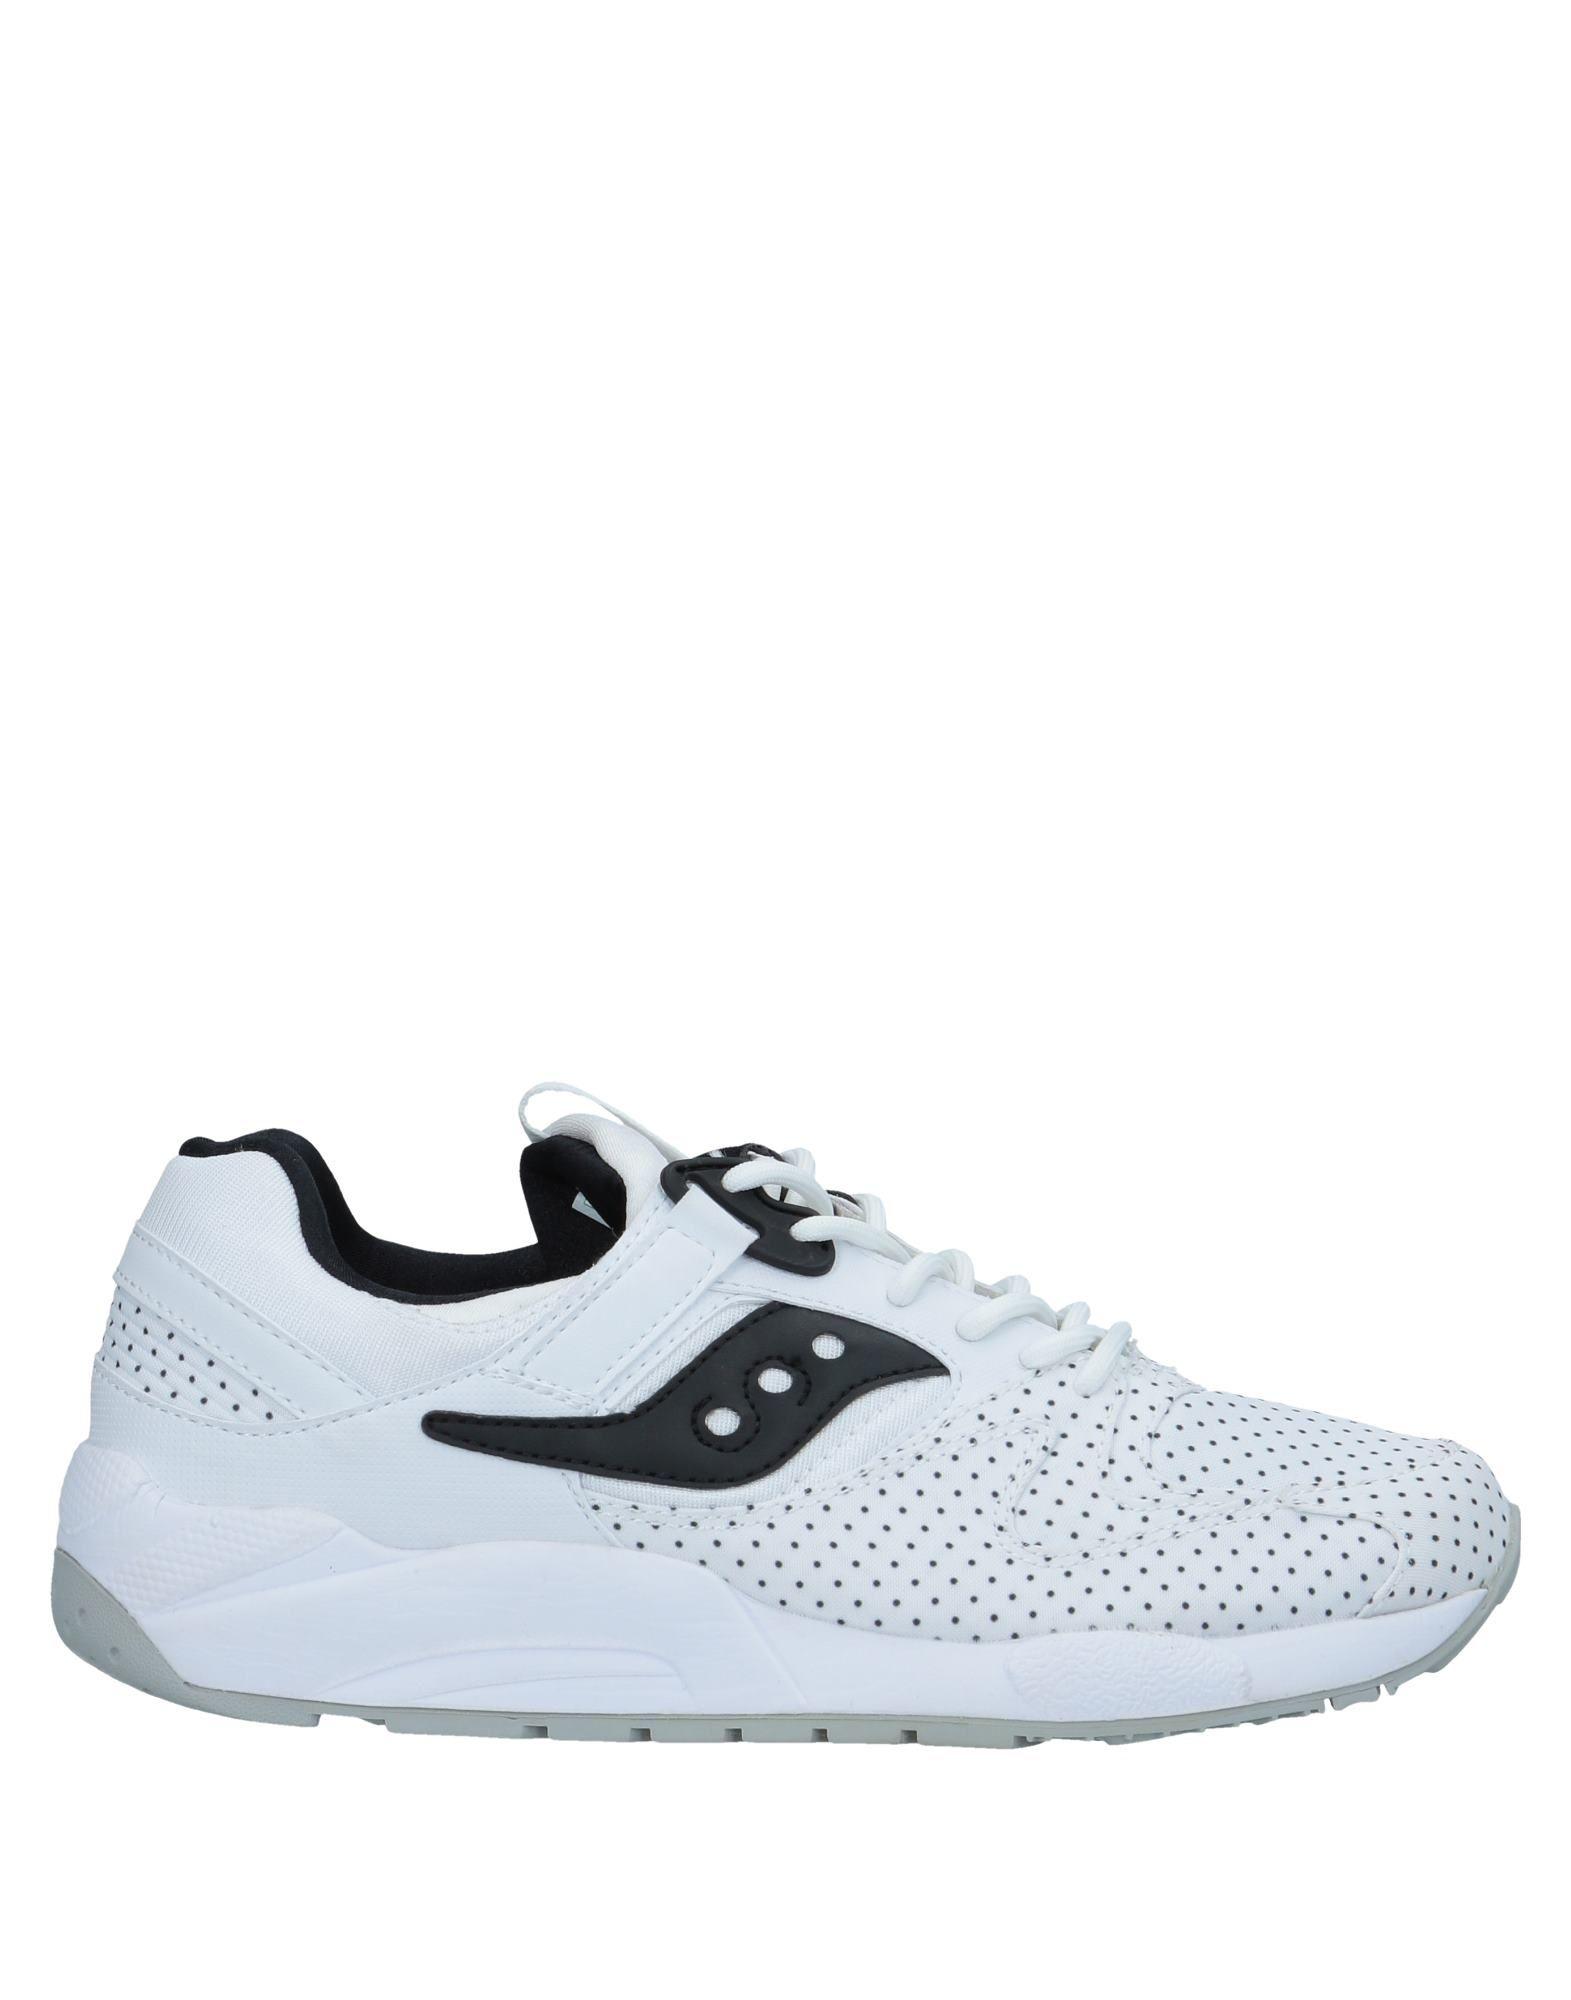 Moda Sneakers Sneakers Moda Saucony Uomo - 11500652UW 2f27c6